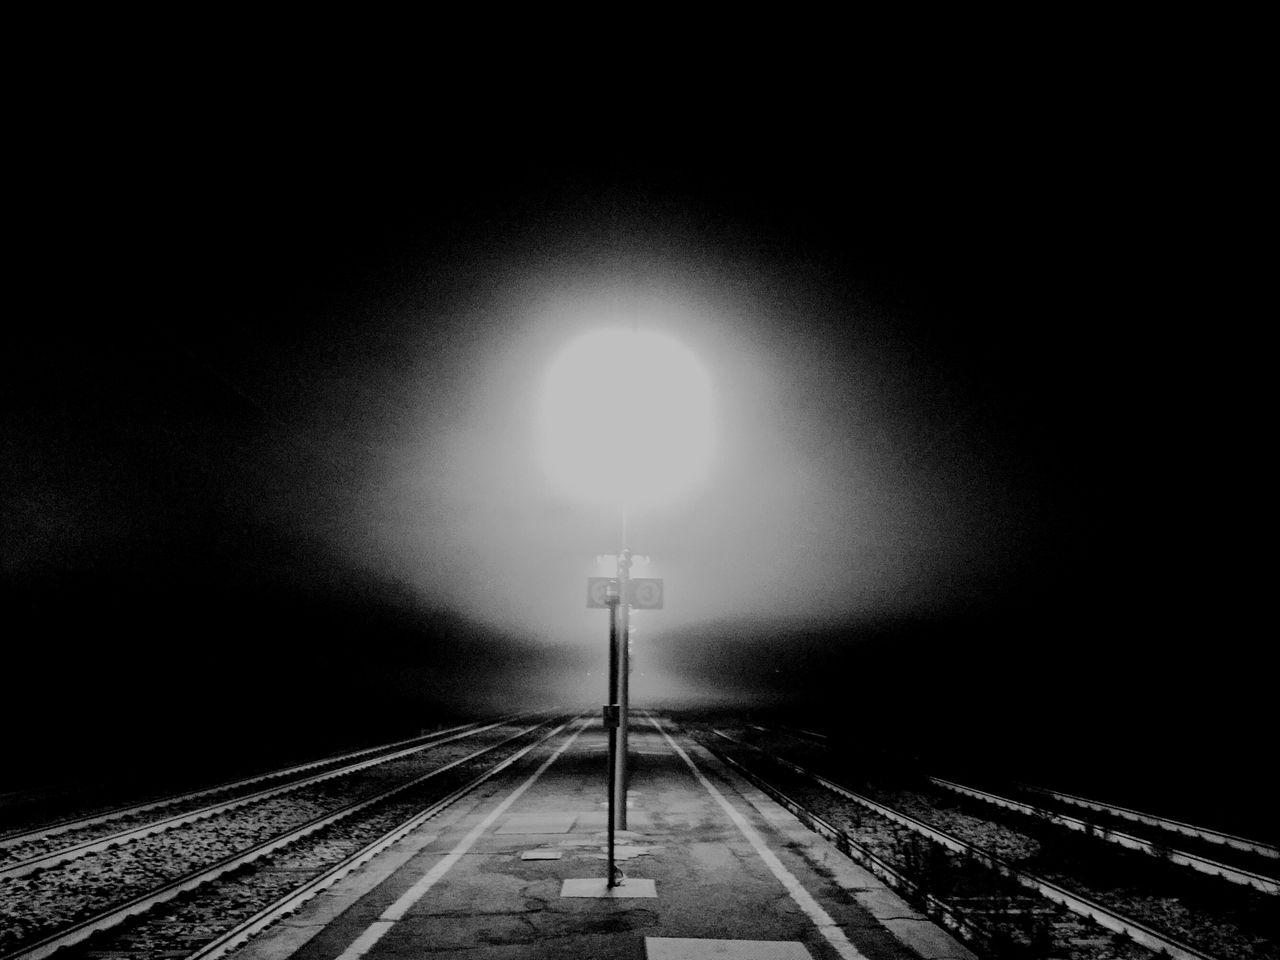 railroad track, rail transportation, transportation, illuminated, night, public transportation, the way forward, railway track, no people, railway signal, clear sky, outdoors, sky